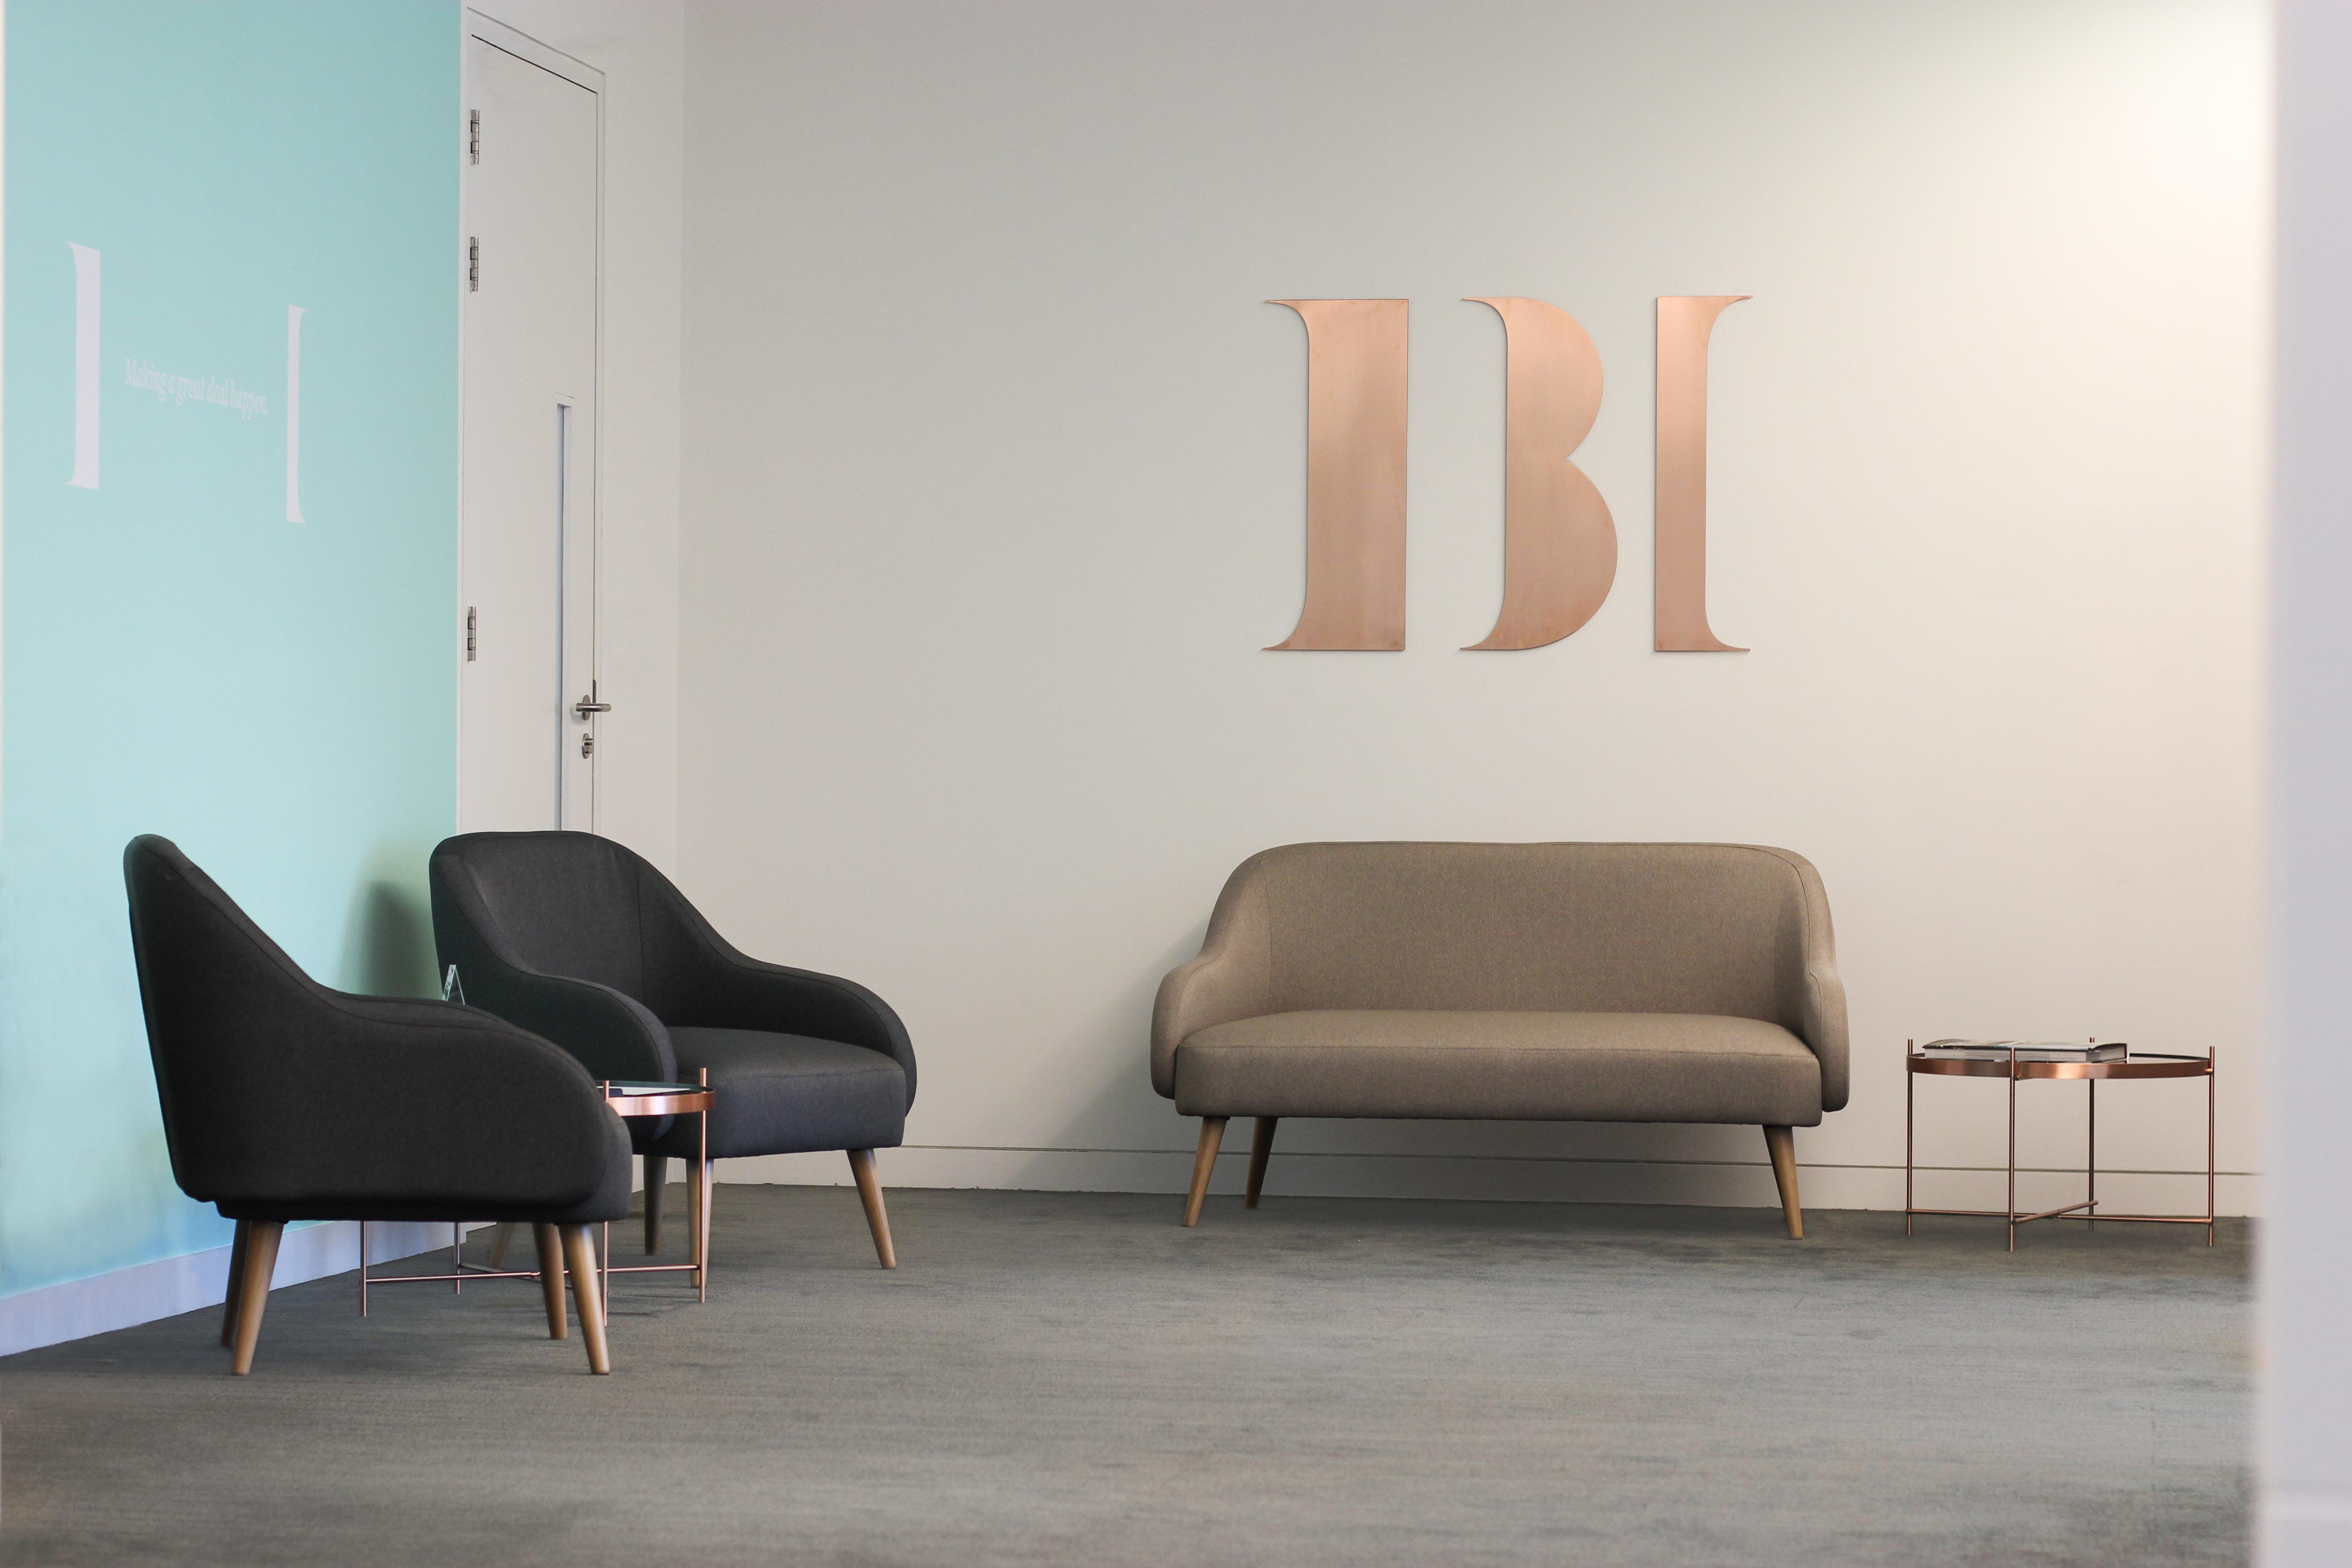 Cover image: IBI Rebrand